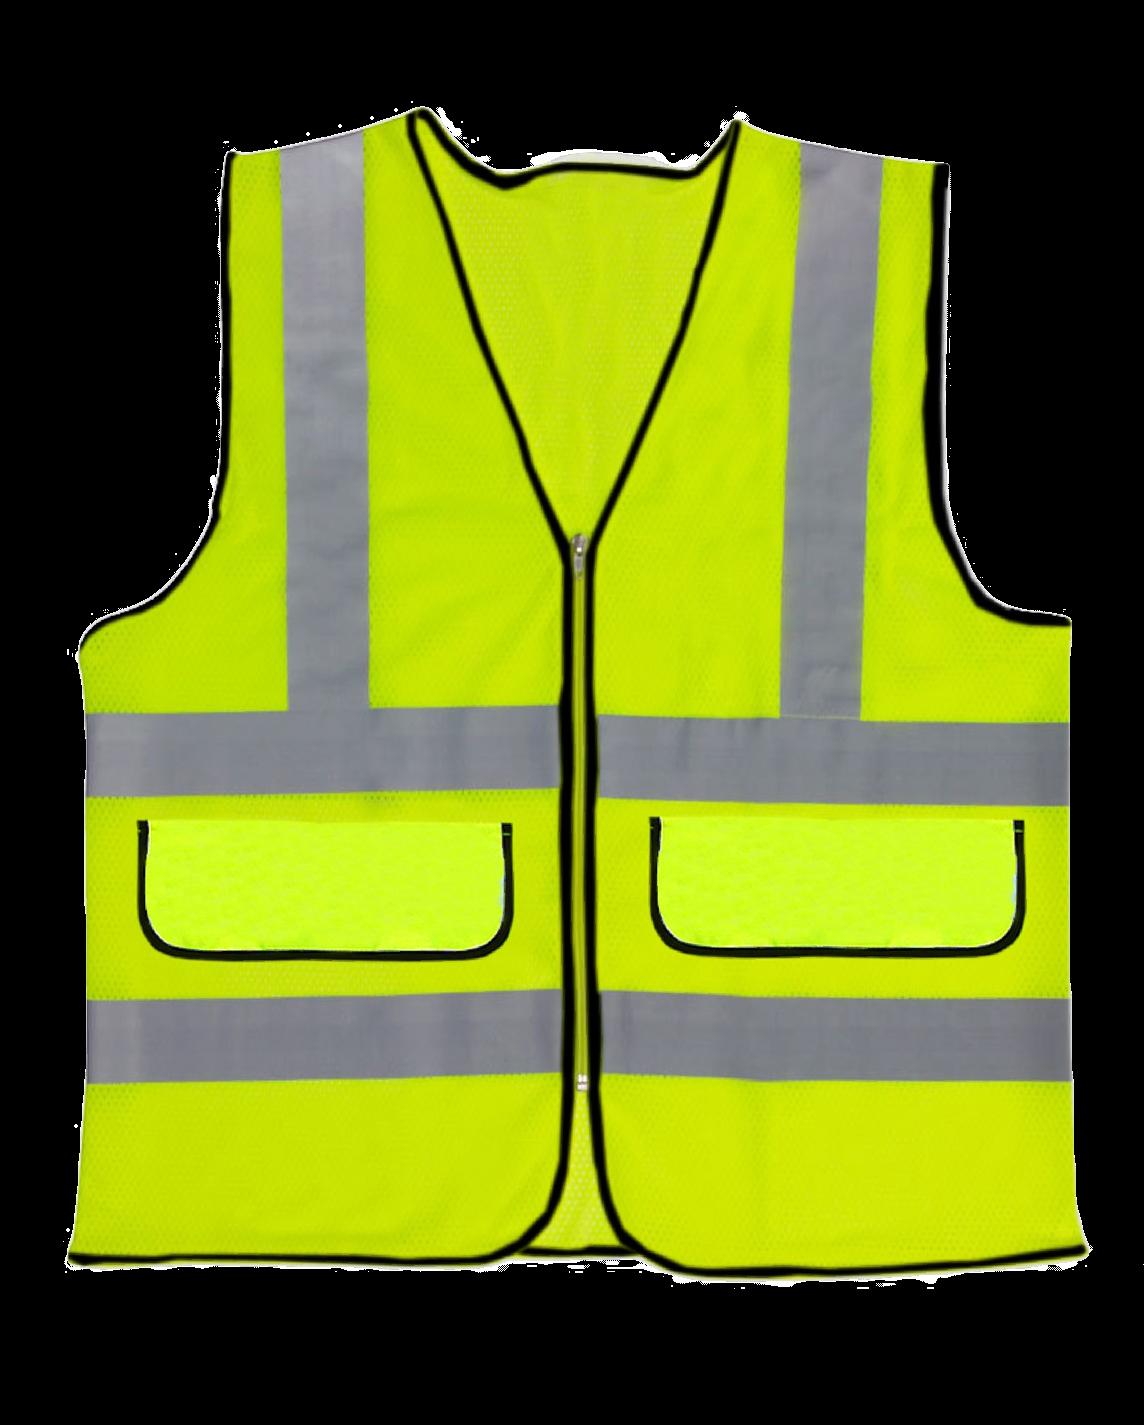 Safety rsv rodamo versatile. Vest clipart